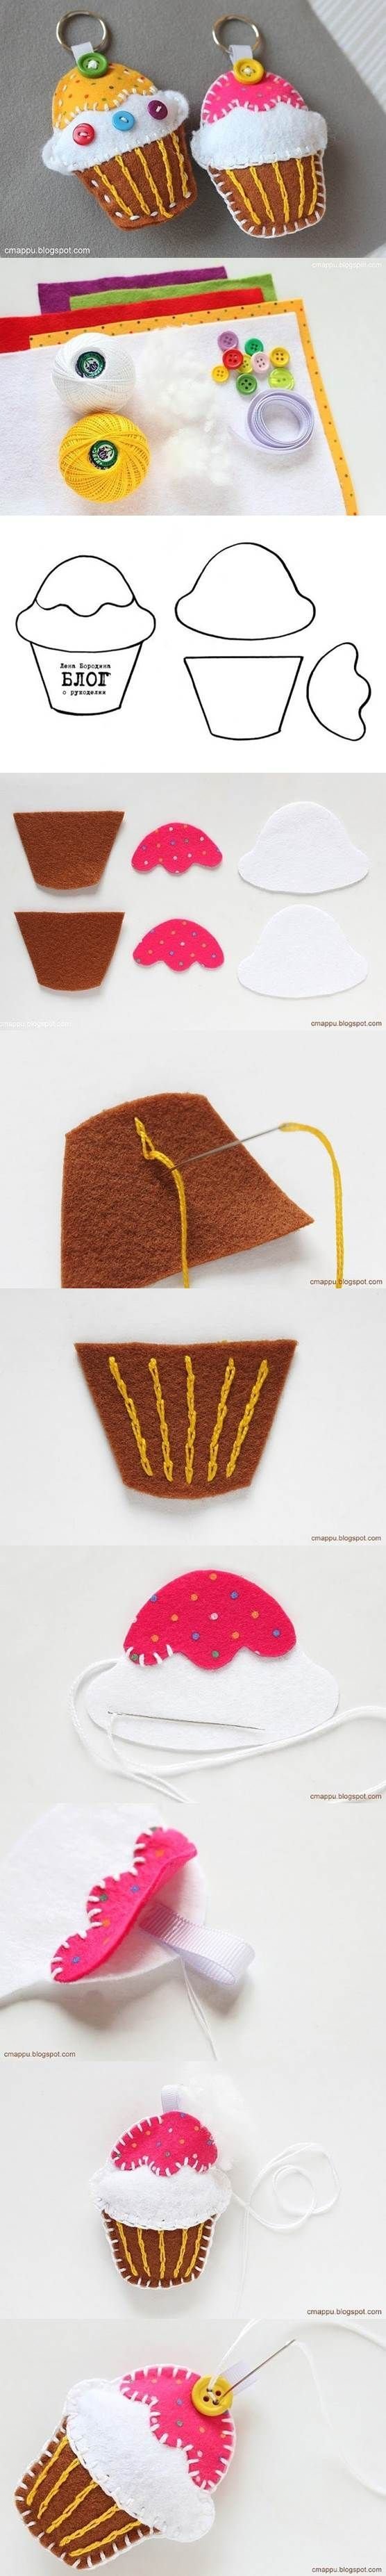 DIY Felt Cupcake Key Chain | iCreativeIdeas.com Like Us on Facebook ==> https://www.facebook.com/icreativeideas